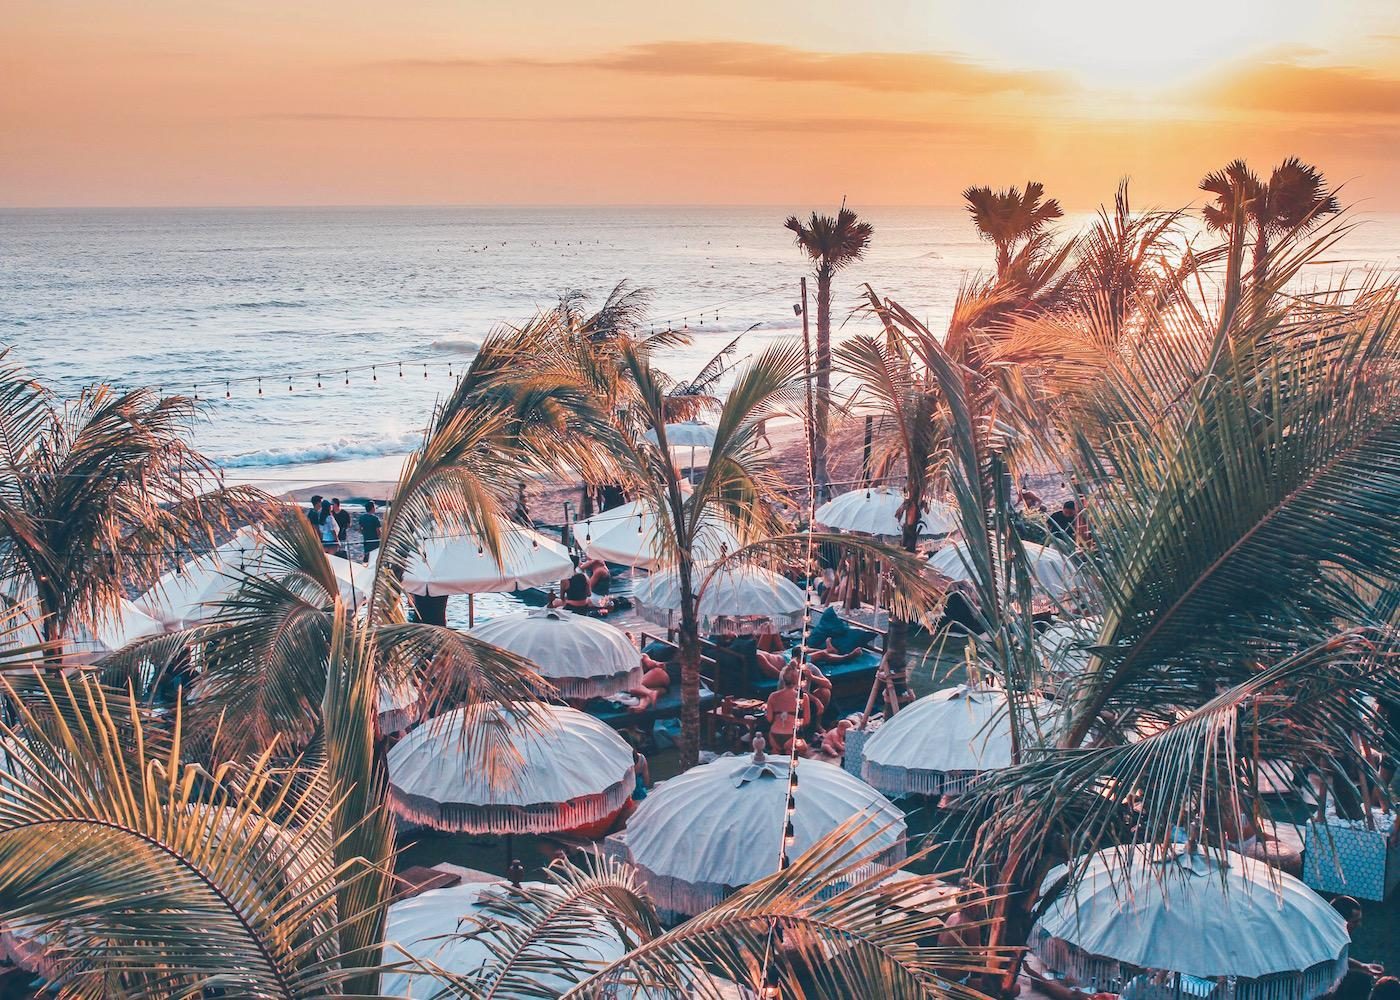 Nočno življenje na Baliju